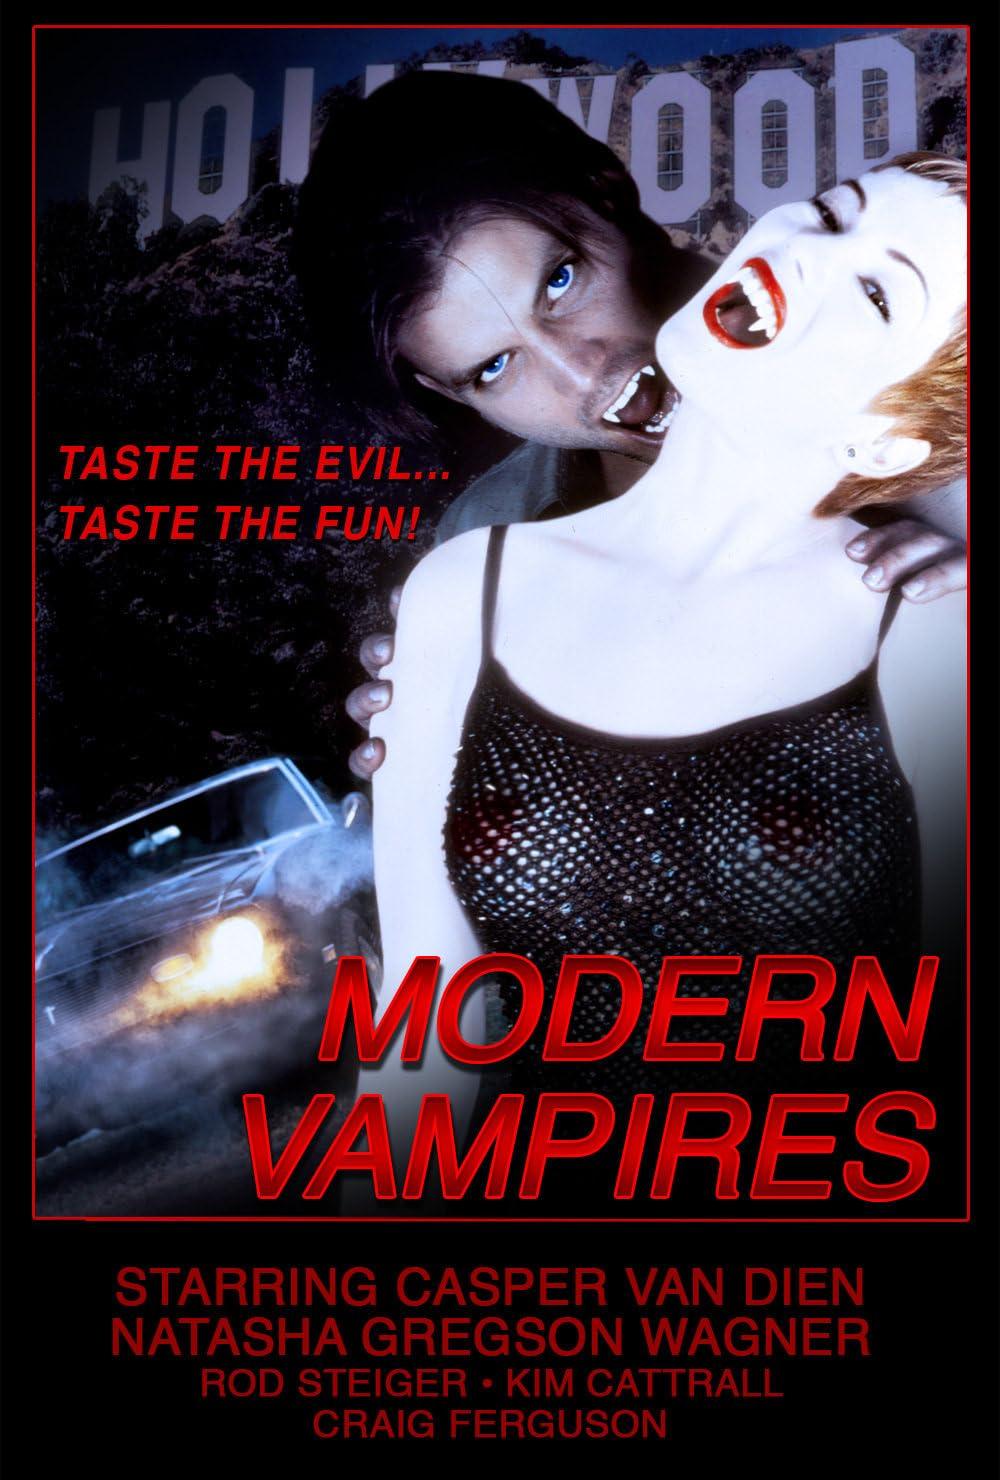 Modern Vampires (1998) Hindi Dubbed